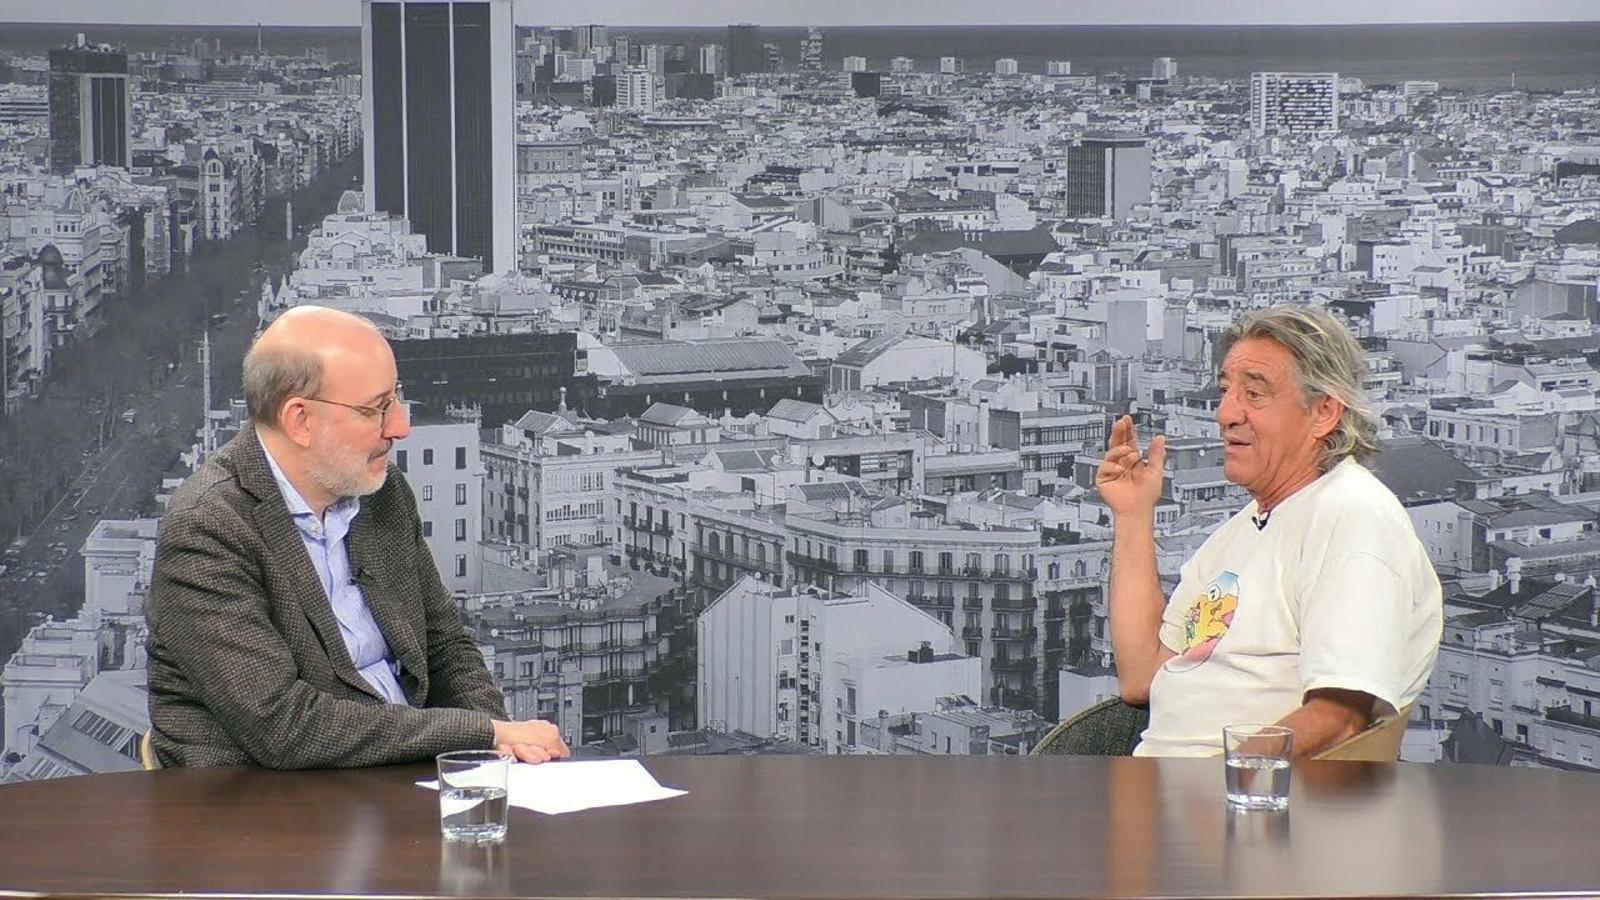 Entrevista d'Antoni Bassas a Tortell Poltrona